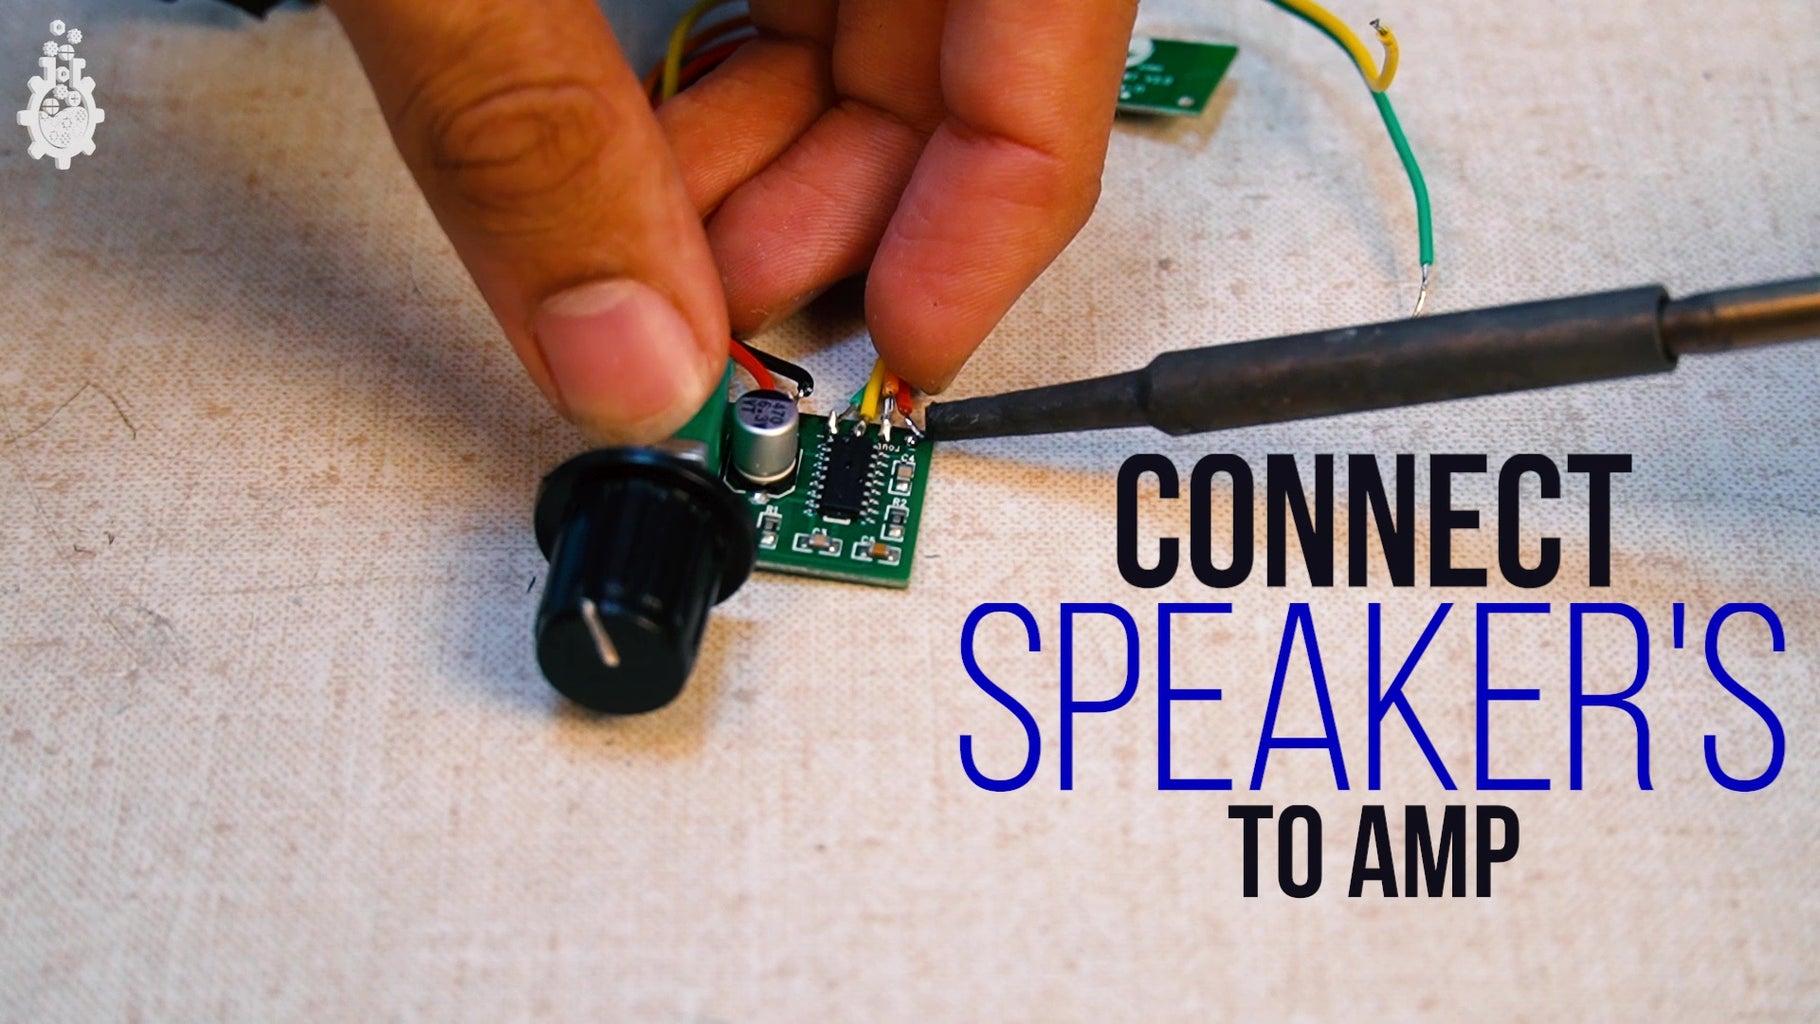 Solder the Speaker Wire to Amplifier